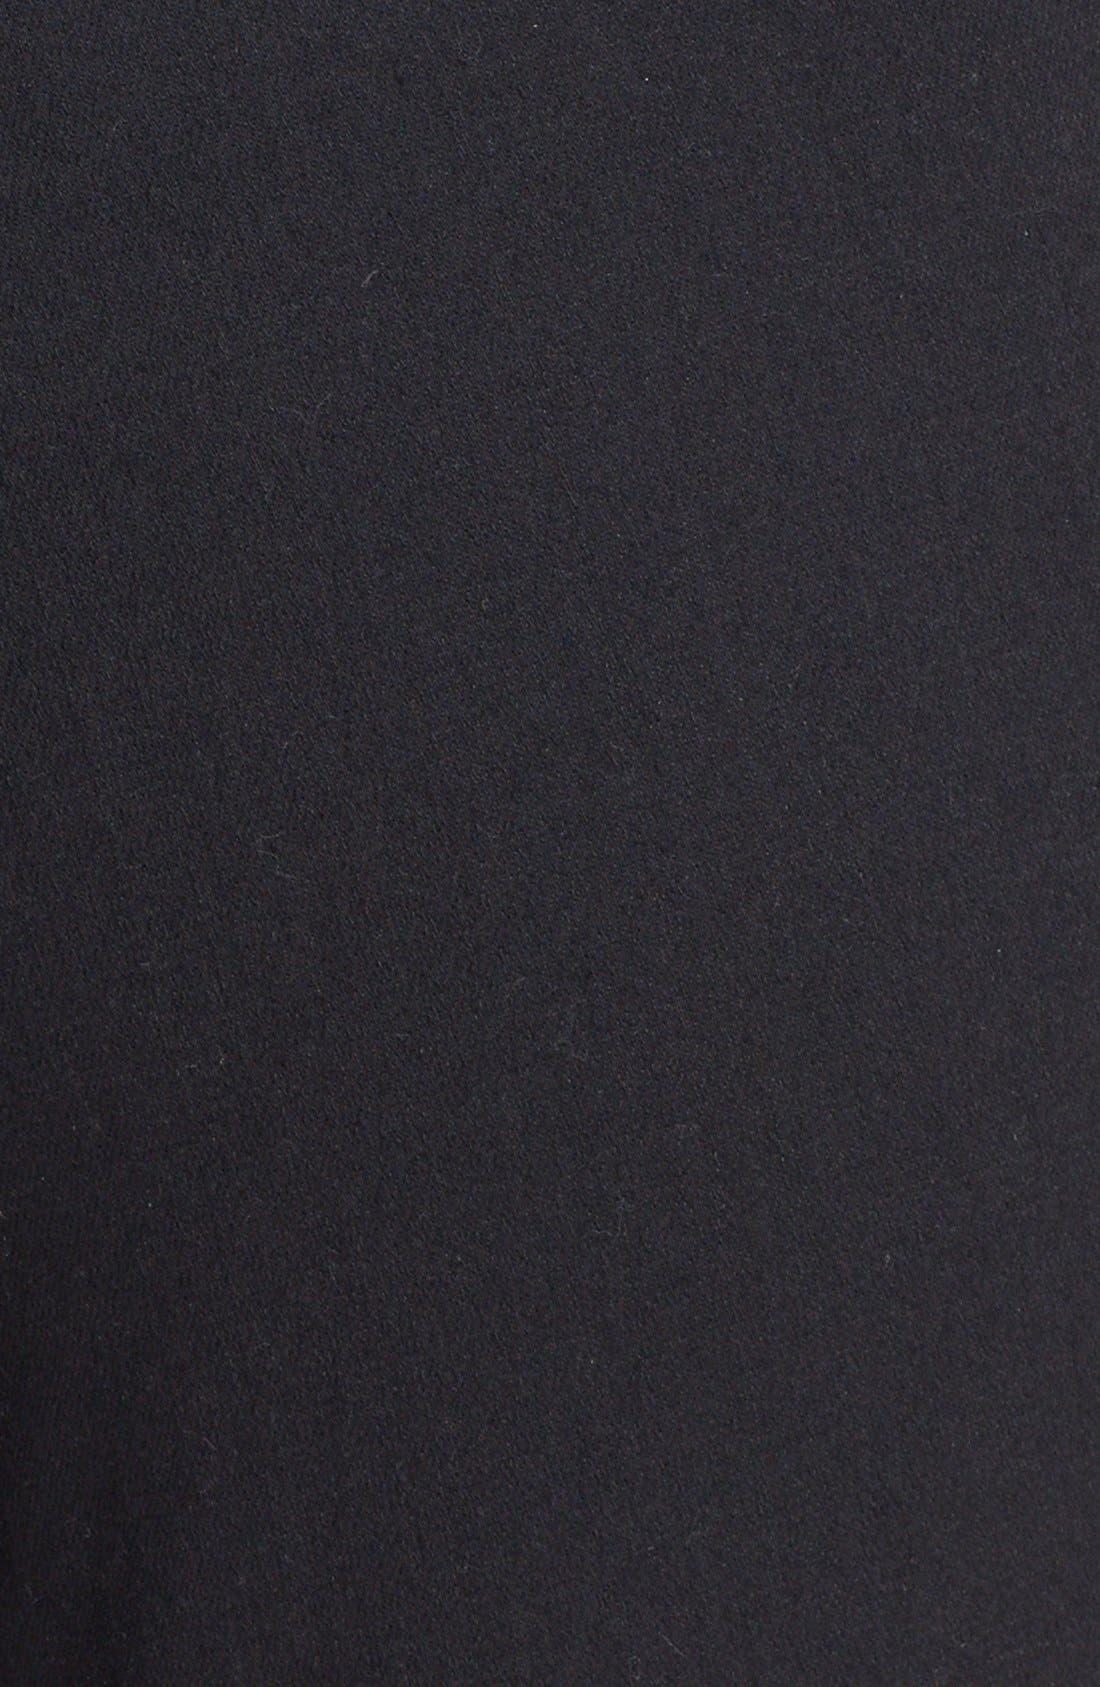 Skinny Crop Trousers,                             Alternate thumbnail 6, color,                             001